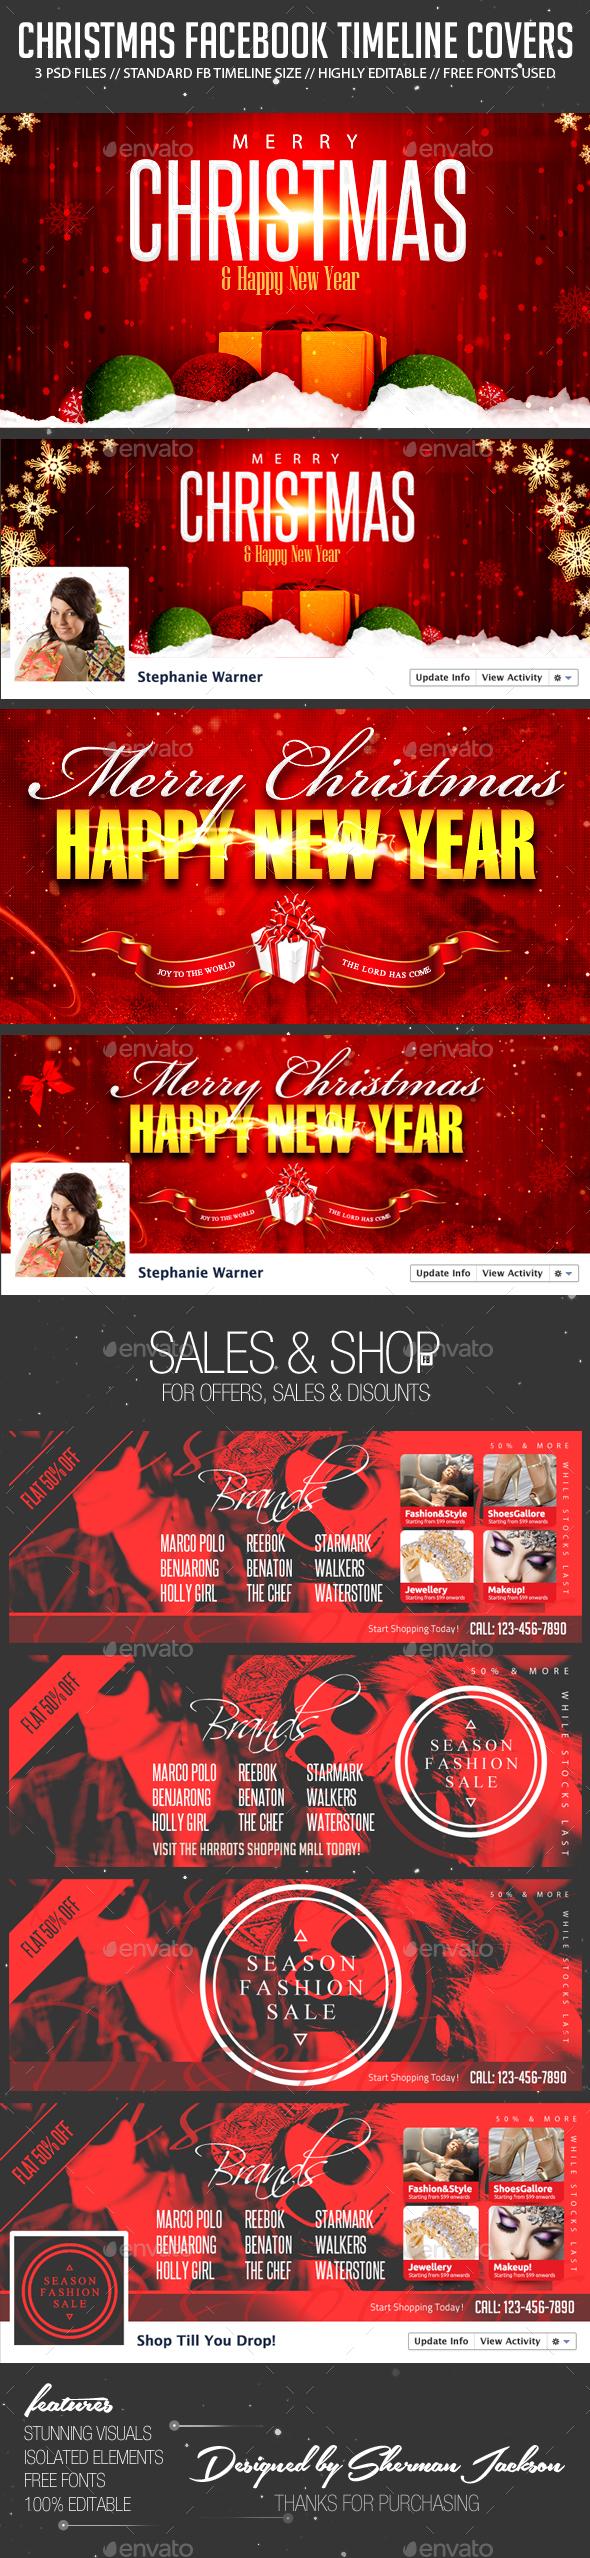 Christmas & Seasonal Sales FB Cover Photos - Facebook Timeline Covers Social Media